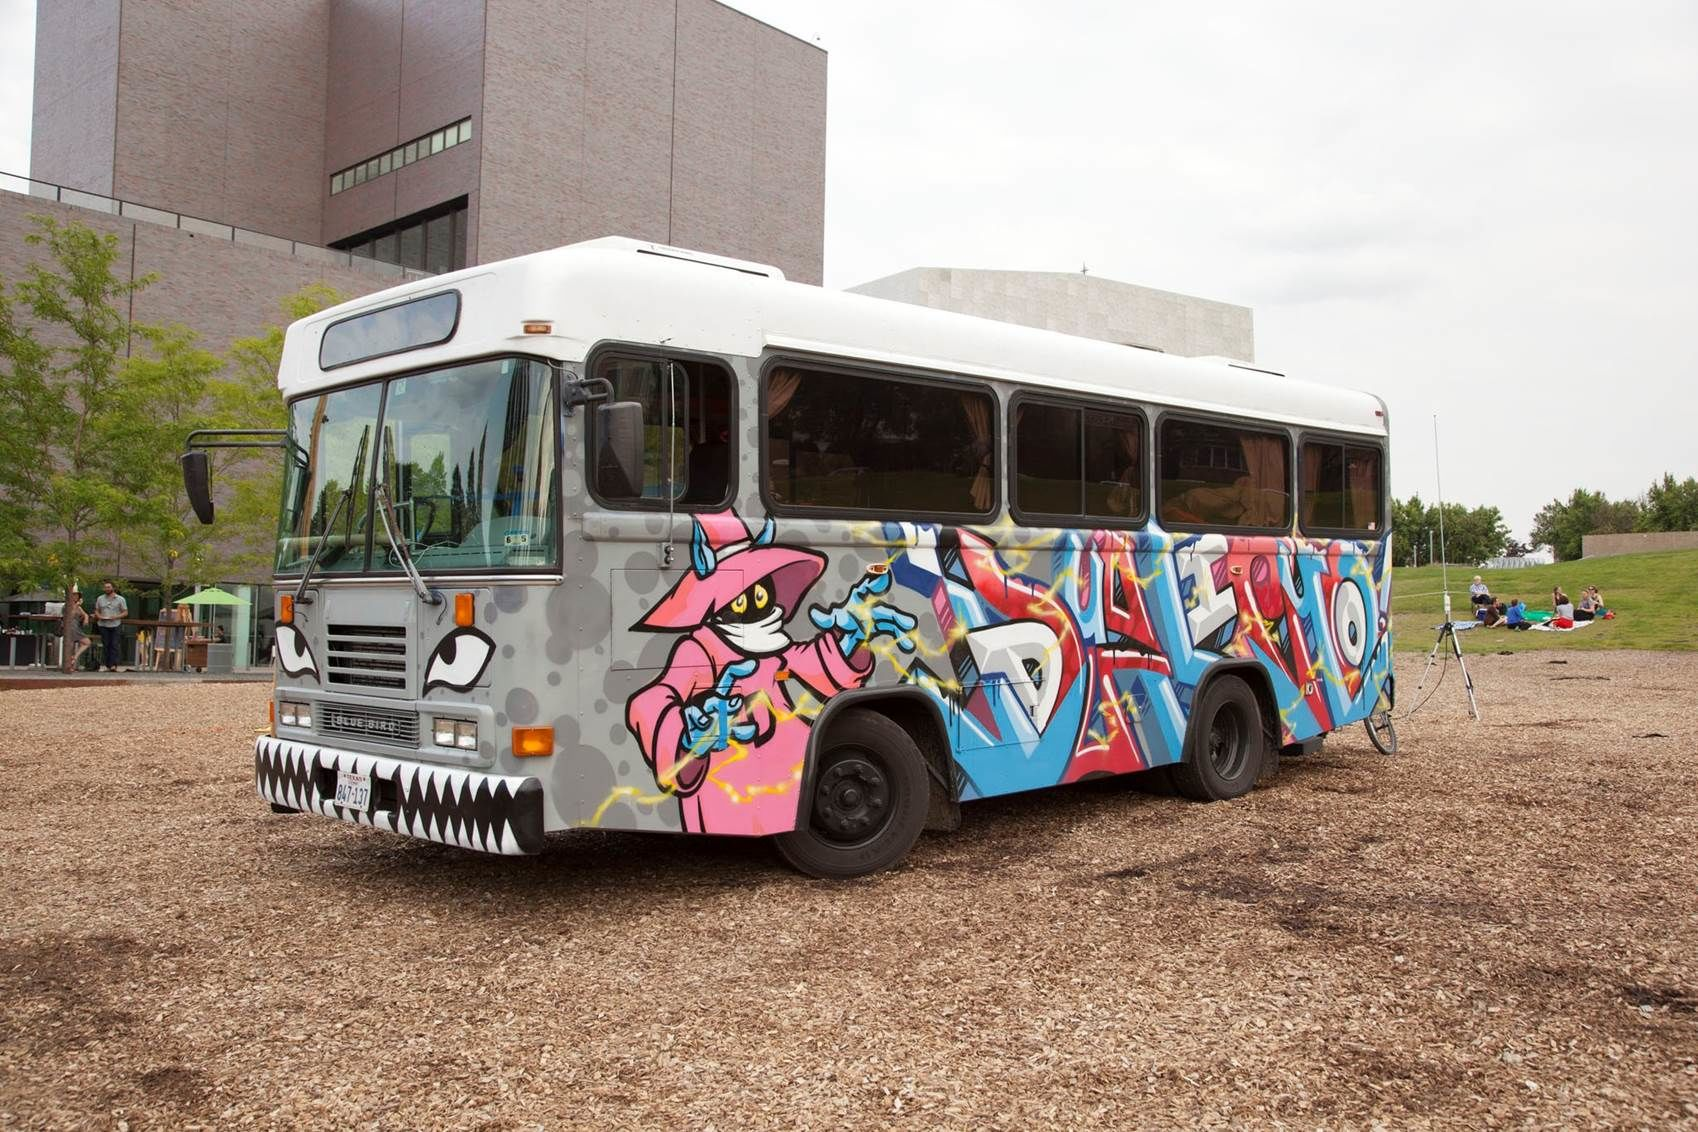 Ecp of bus